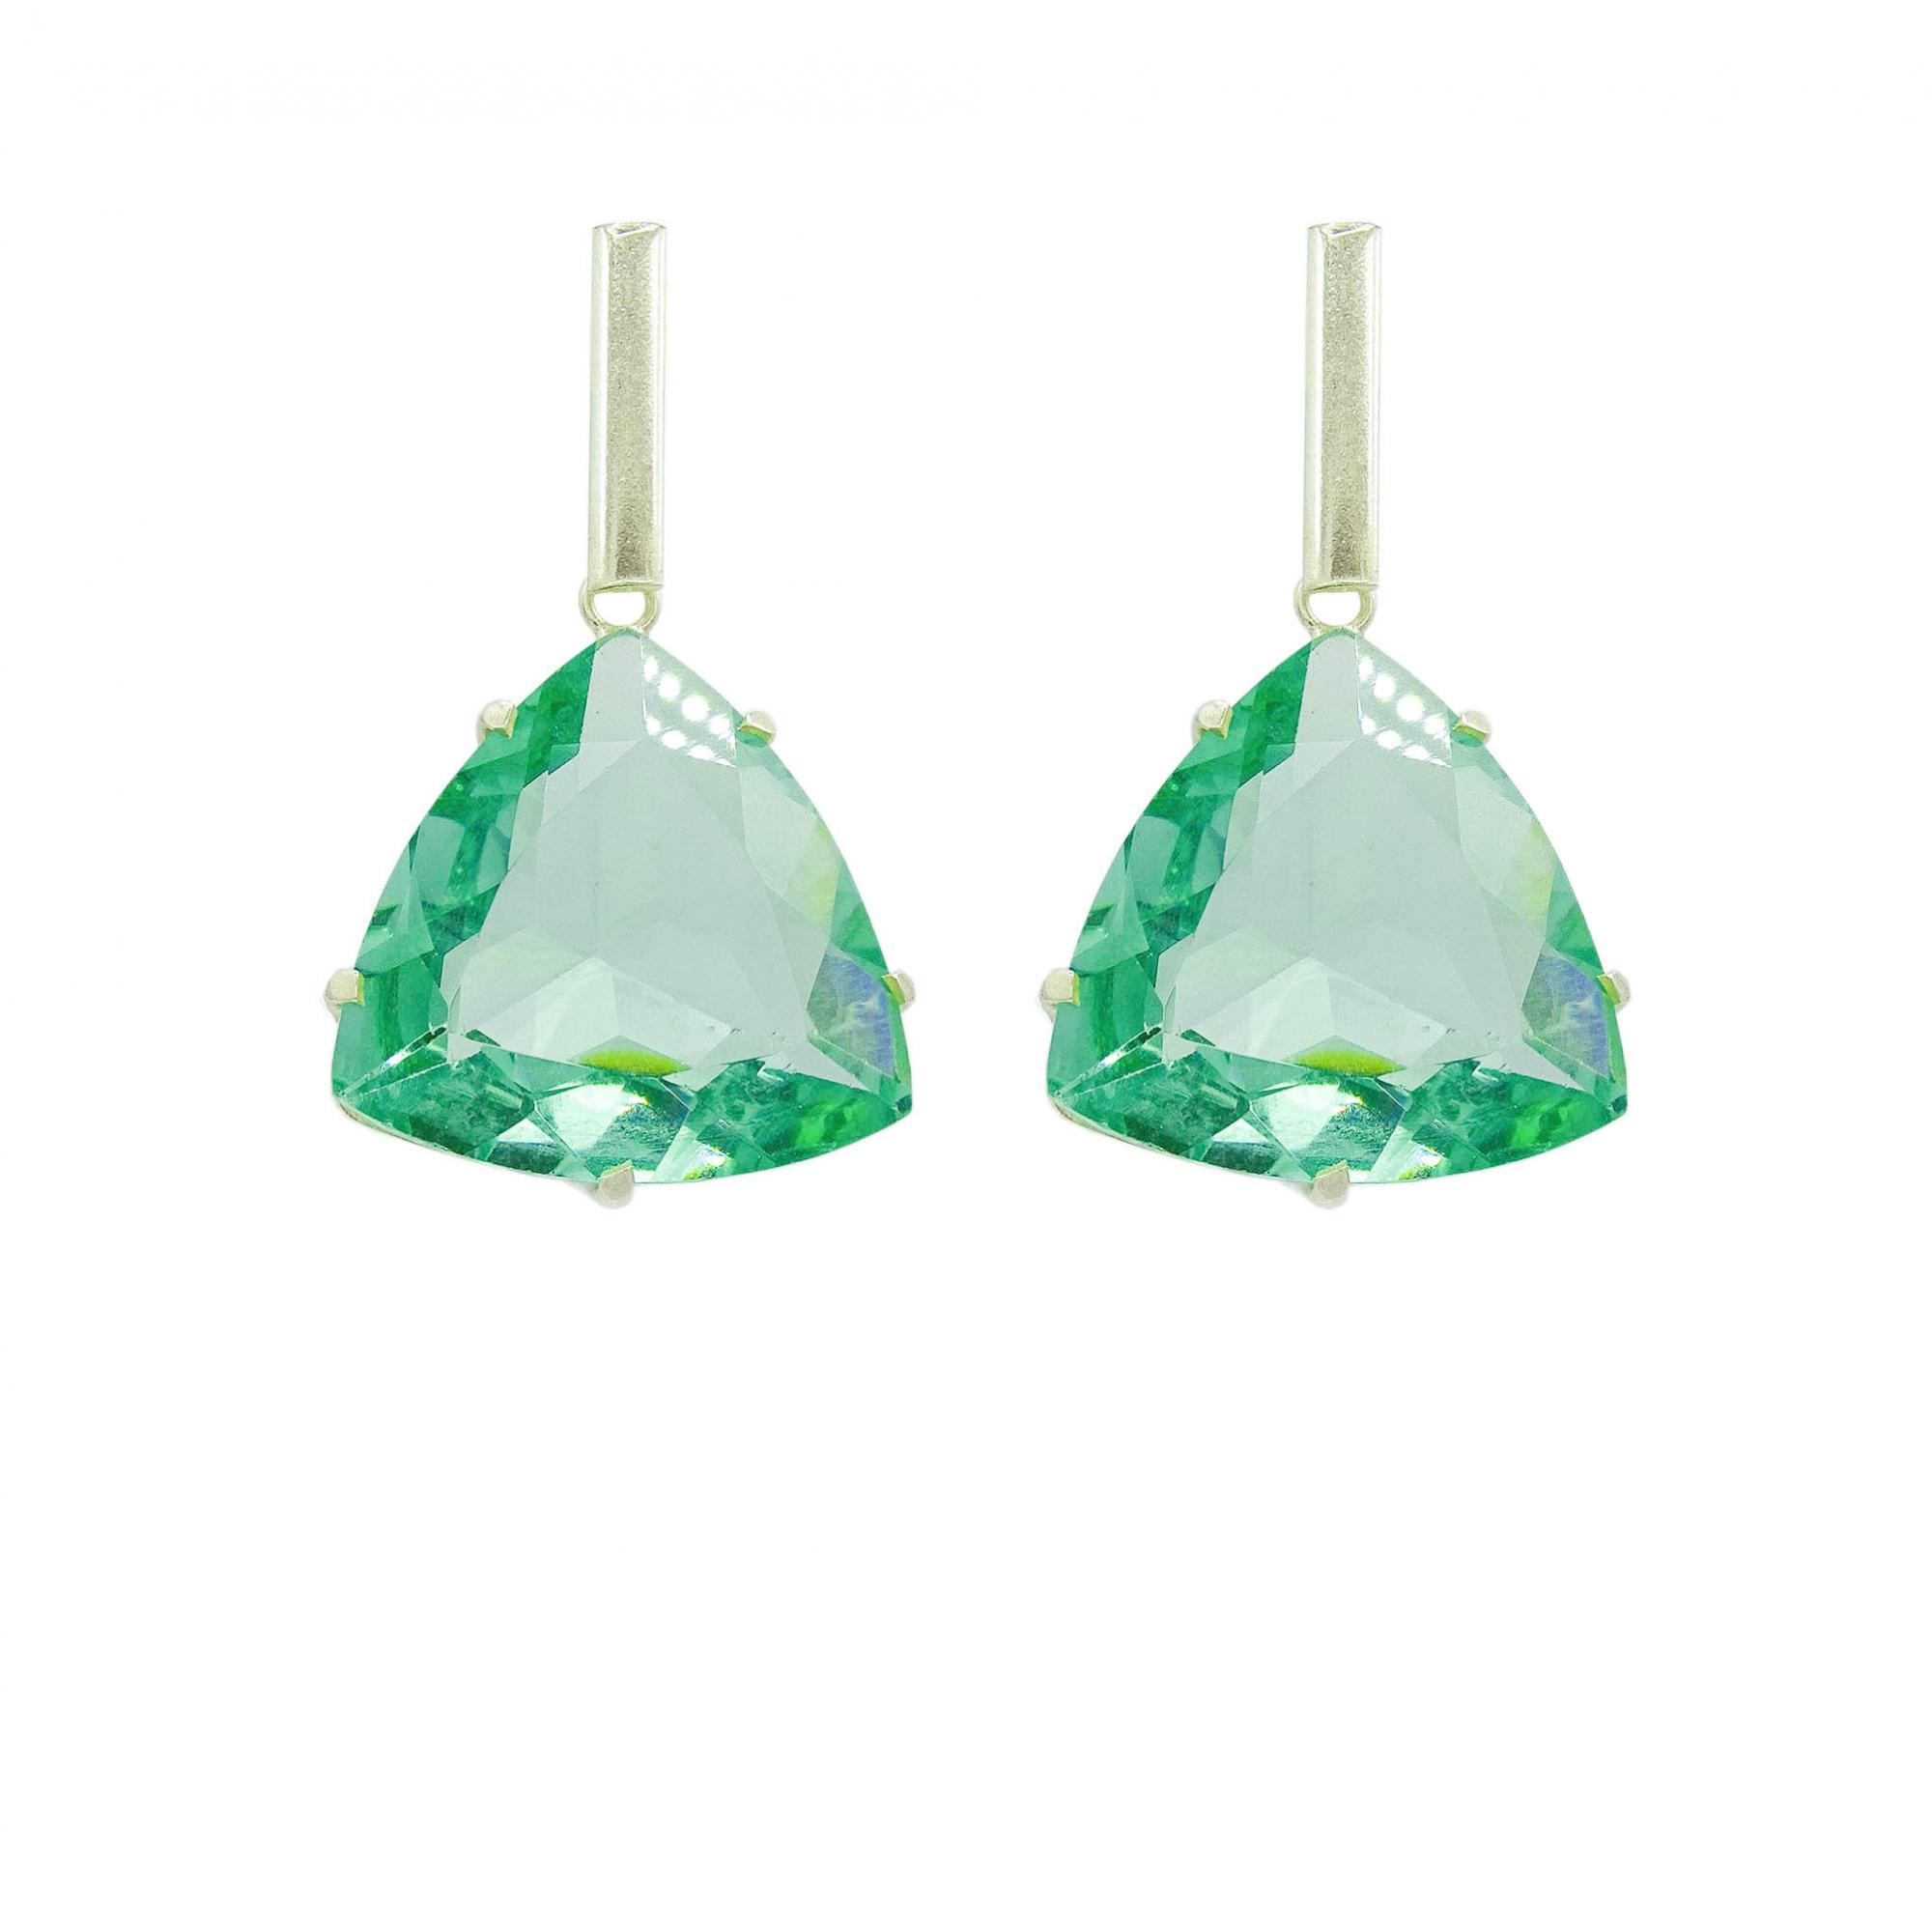 Conjunto de Obsidiana Verde Triangular